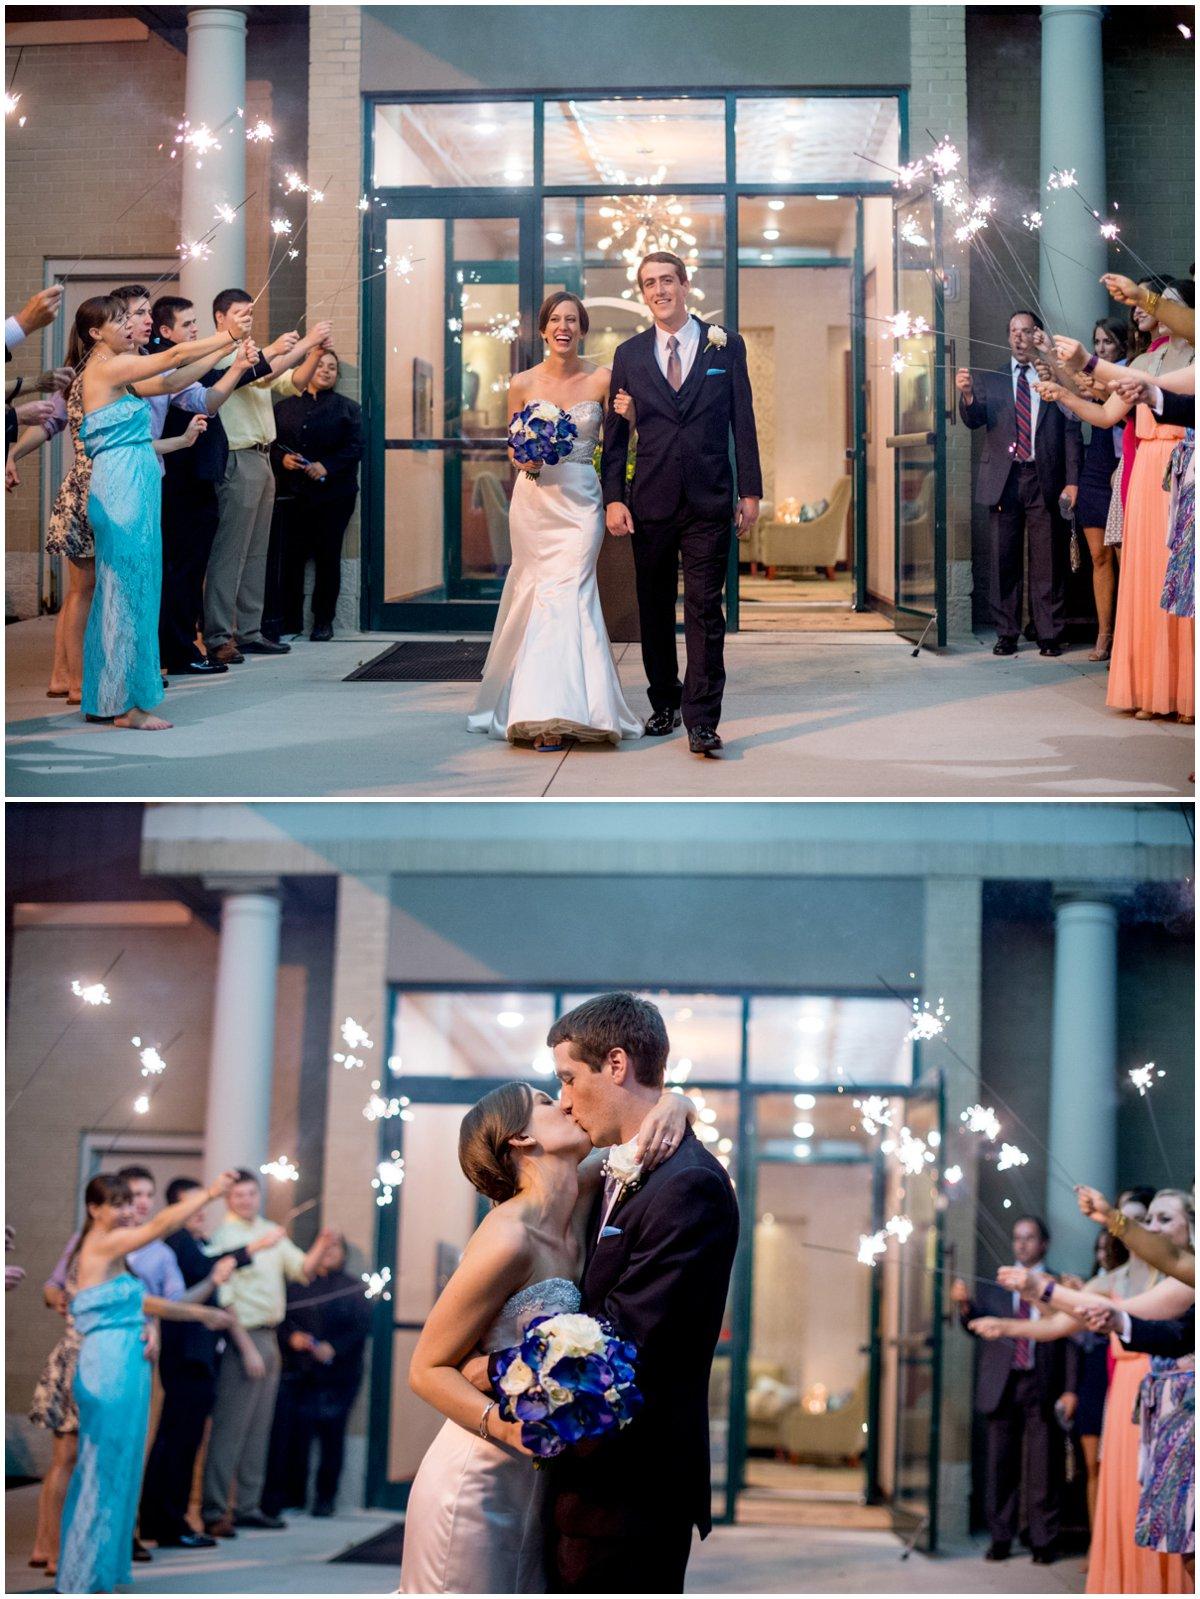 Mavris-wedding-pictures-Nate-Crouch-027.jpg